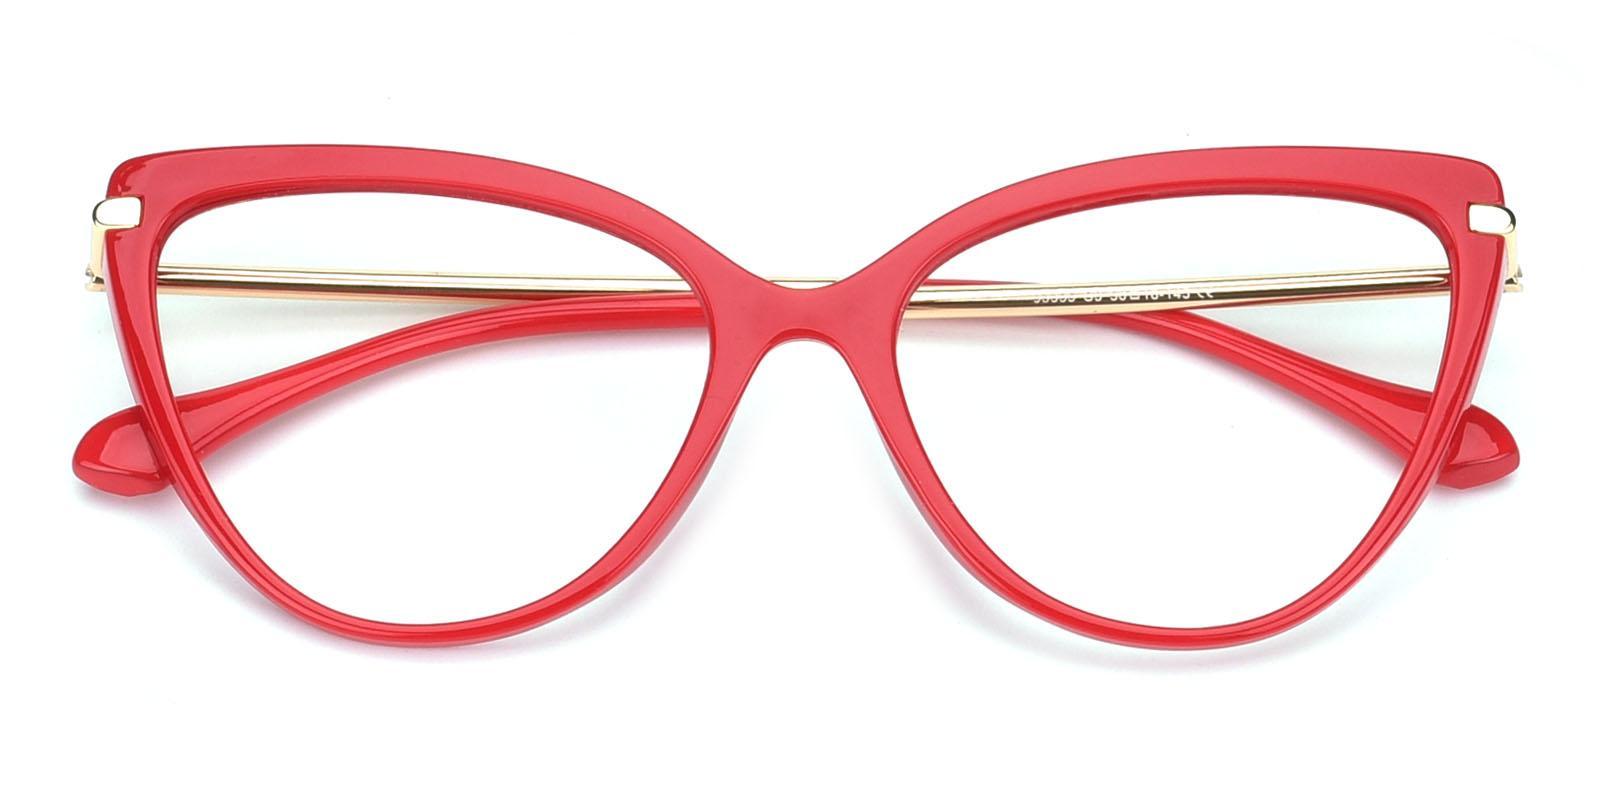 Doris-Red-Cat-Combination-Eyeglasses-detail